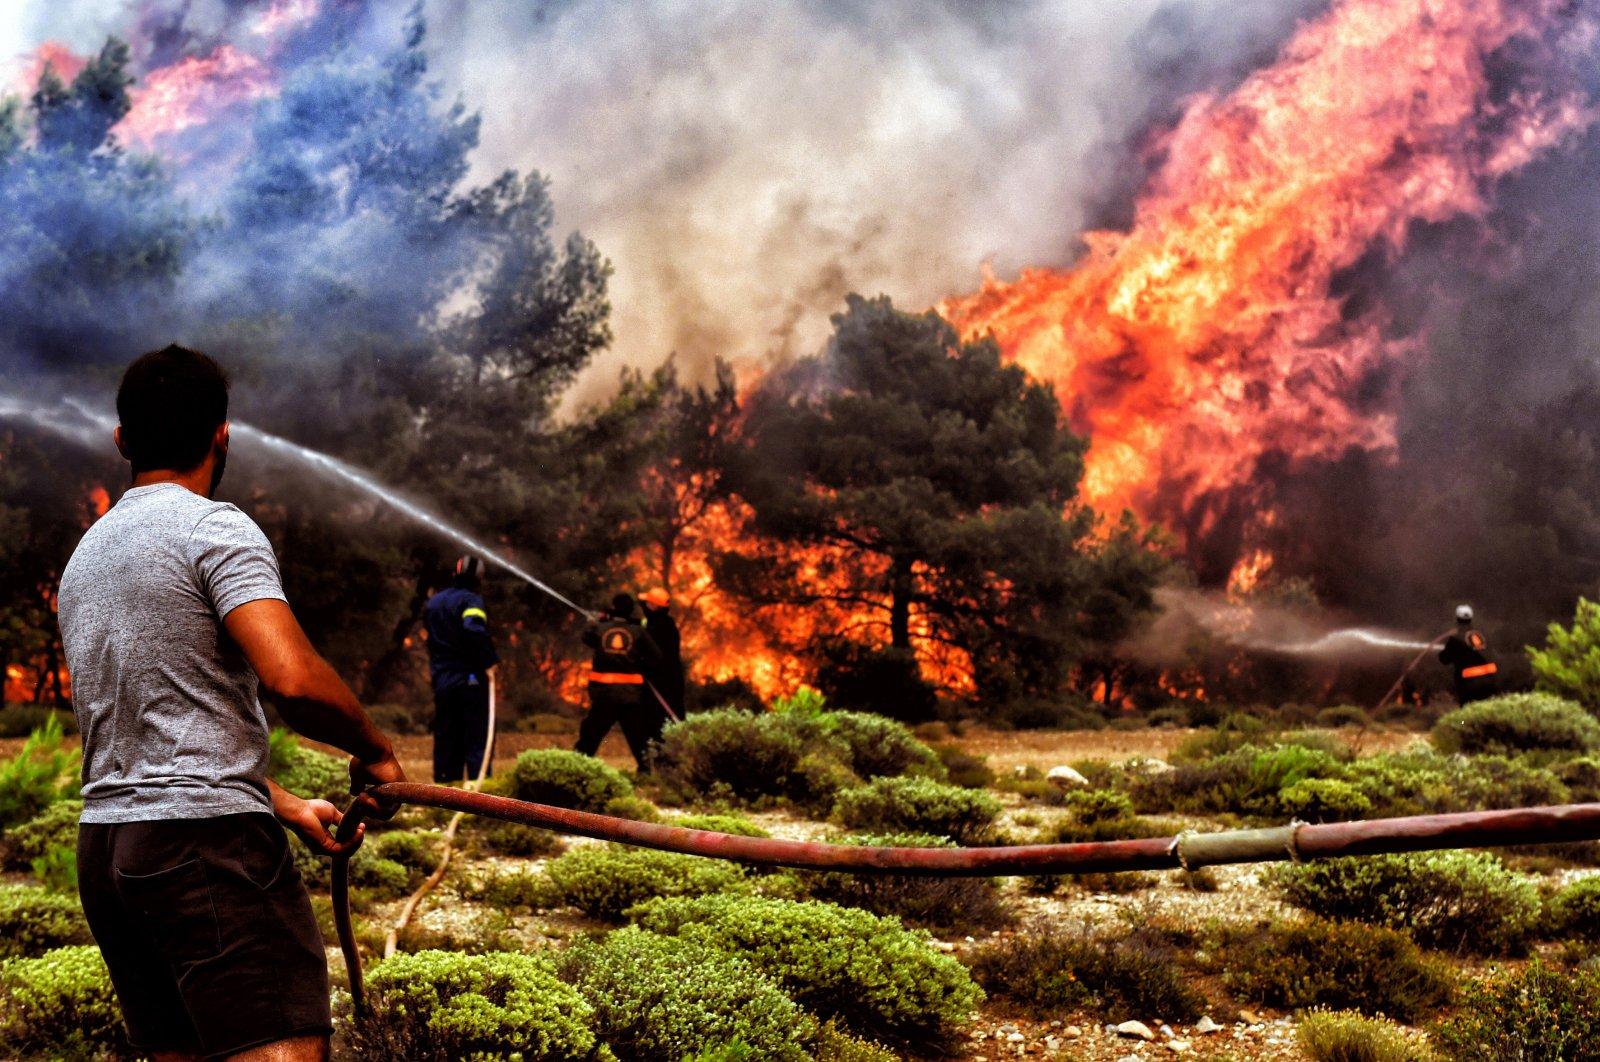 Wildfire rages in near Loutraki, Corinth city, Peloponnese, Greece, July 24, 2018. (EPA-EFE Photo)